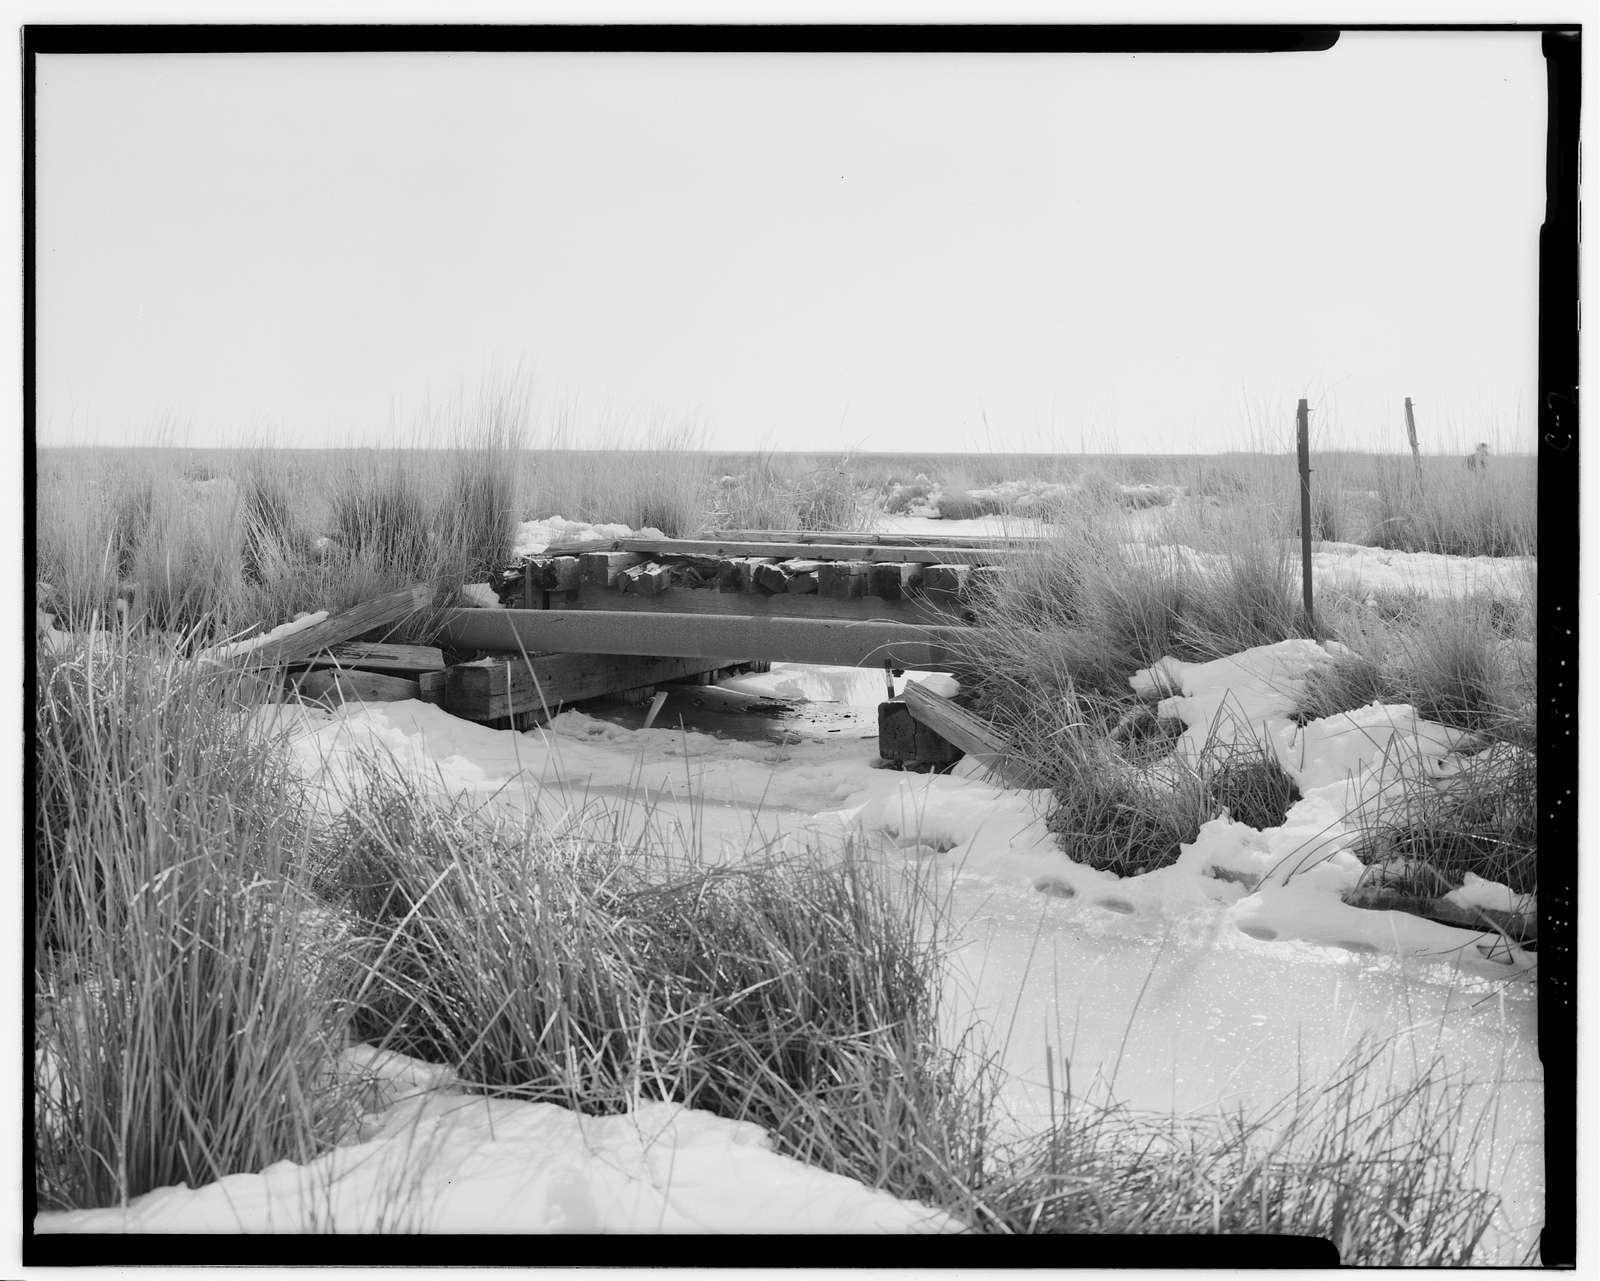 Promontory Route Railroad Trestles, Trestle 789C, 11 miles west of Corrine, Corinne, Box Elder County, UT